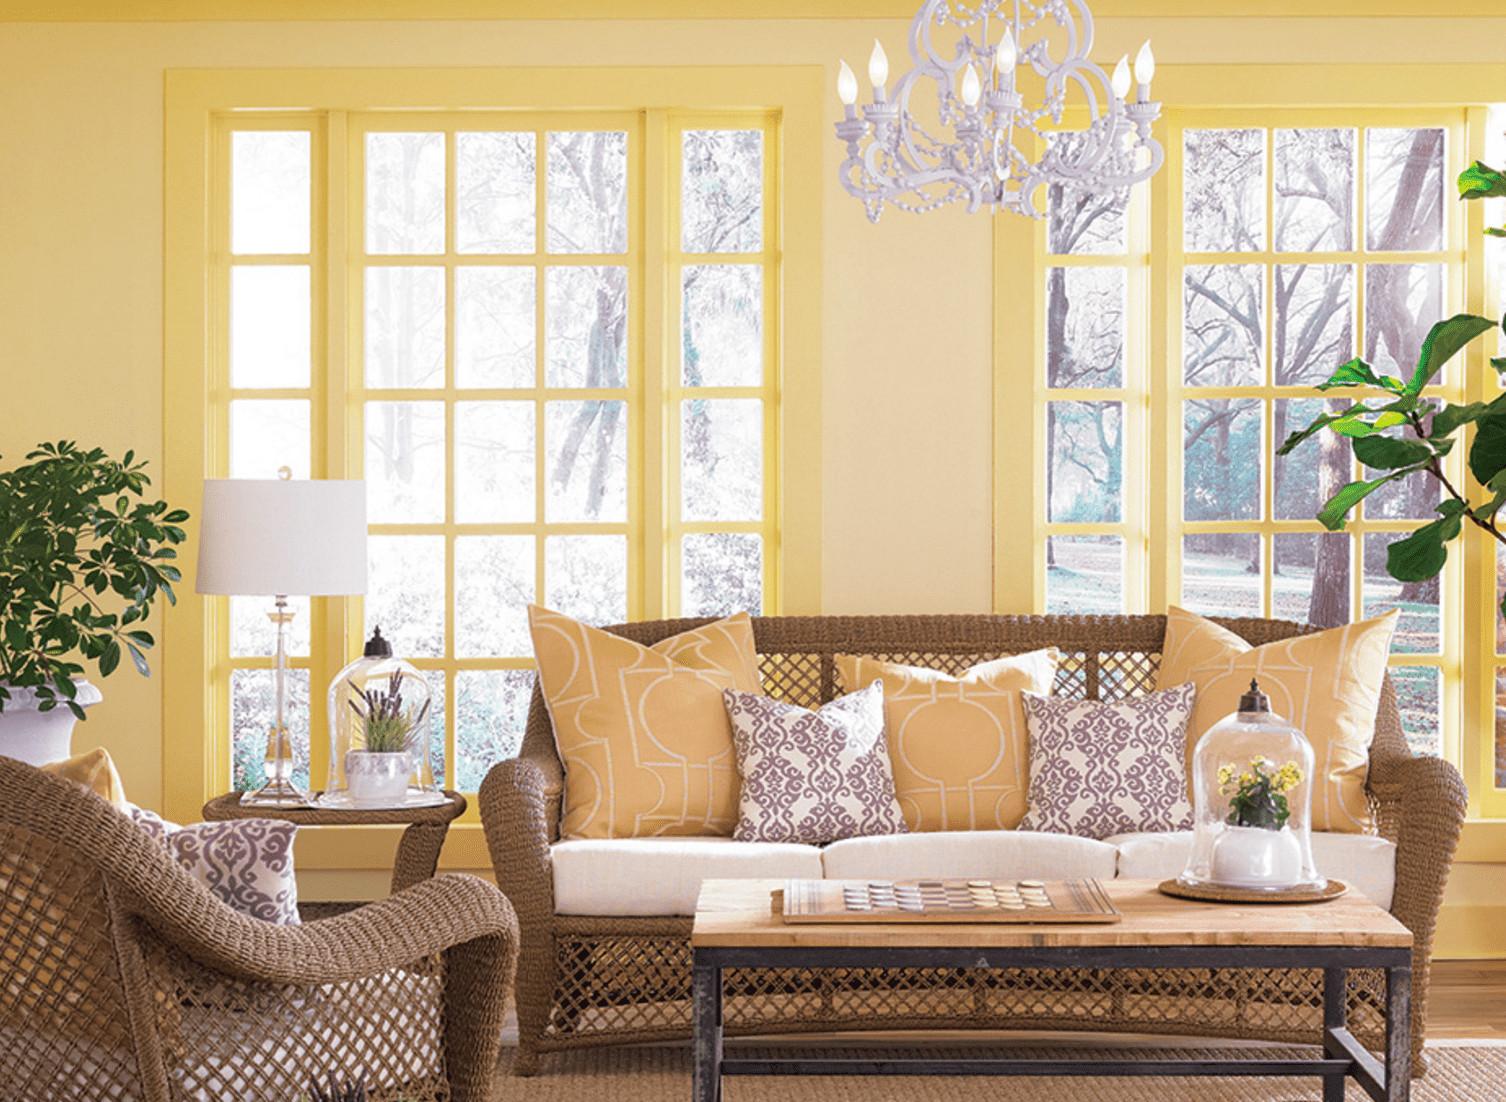 Living Room Paint Color  11 Best Neutral Paint Colors for Your Home